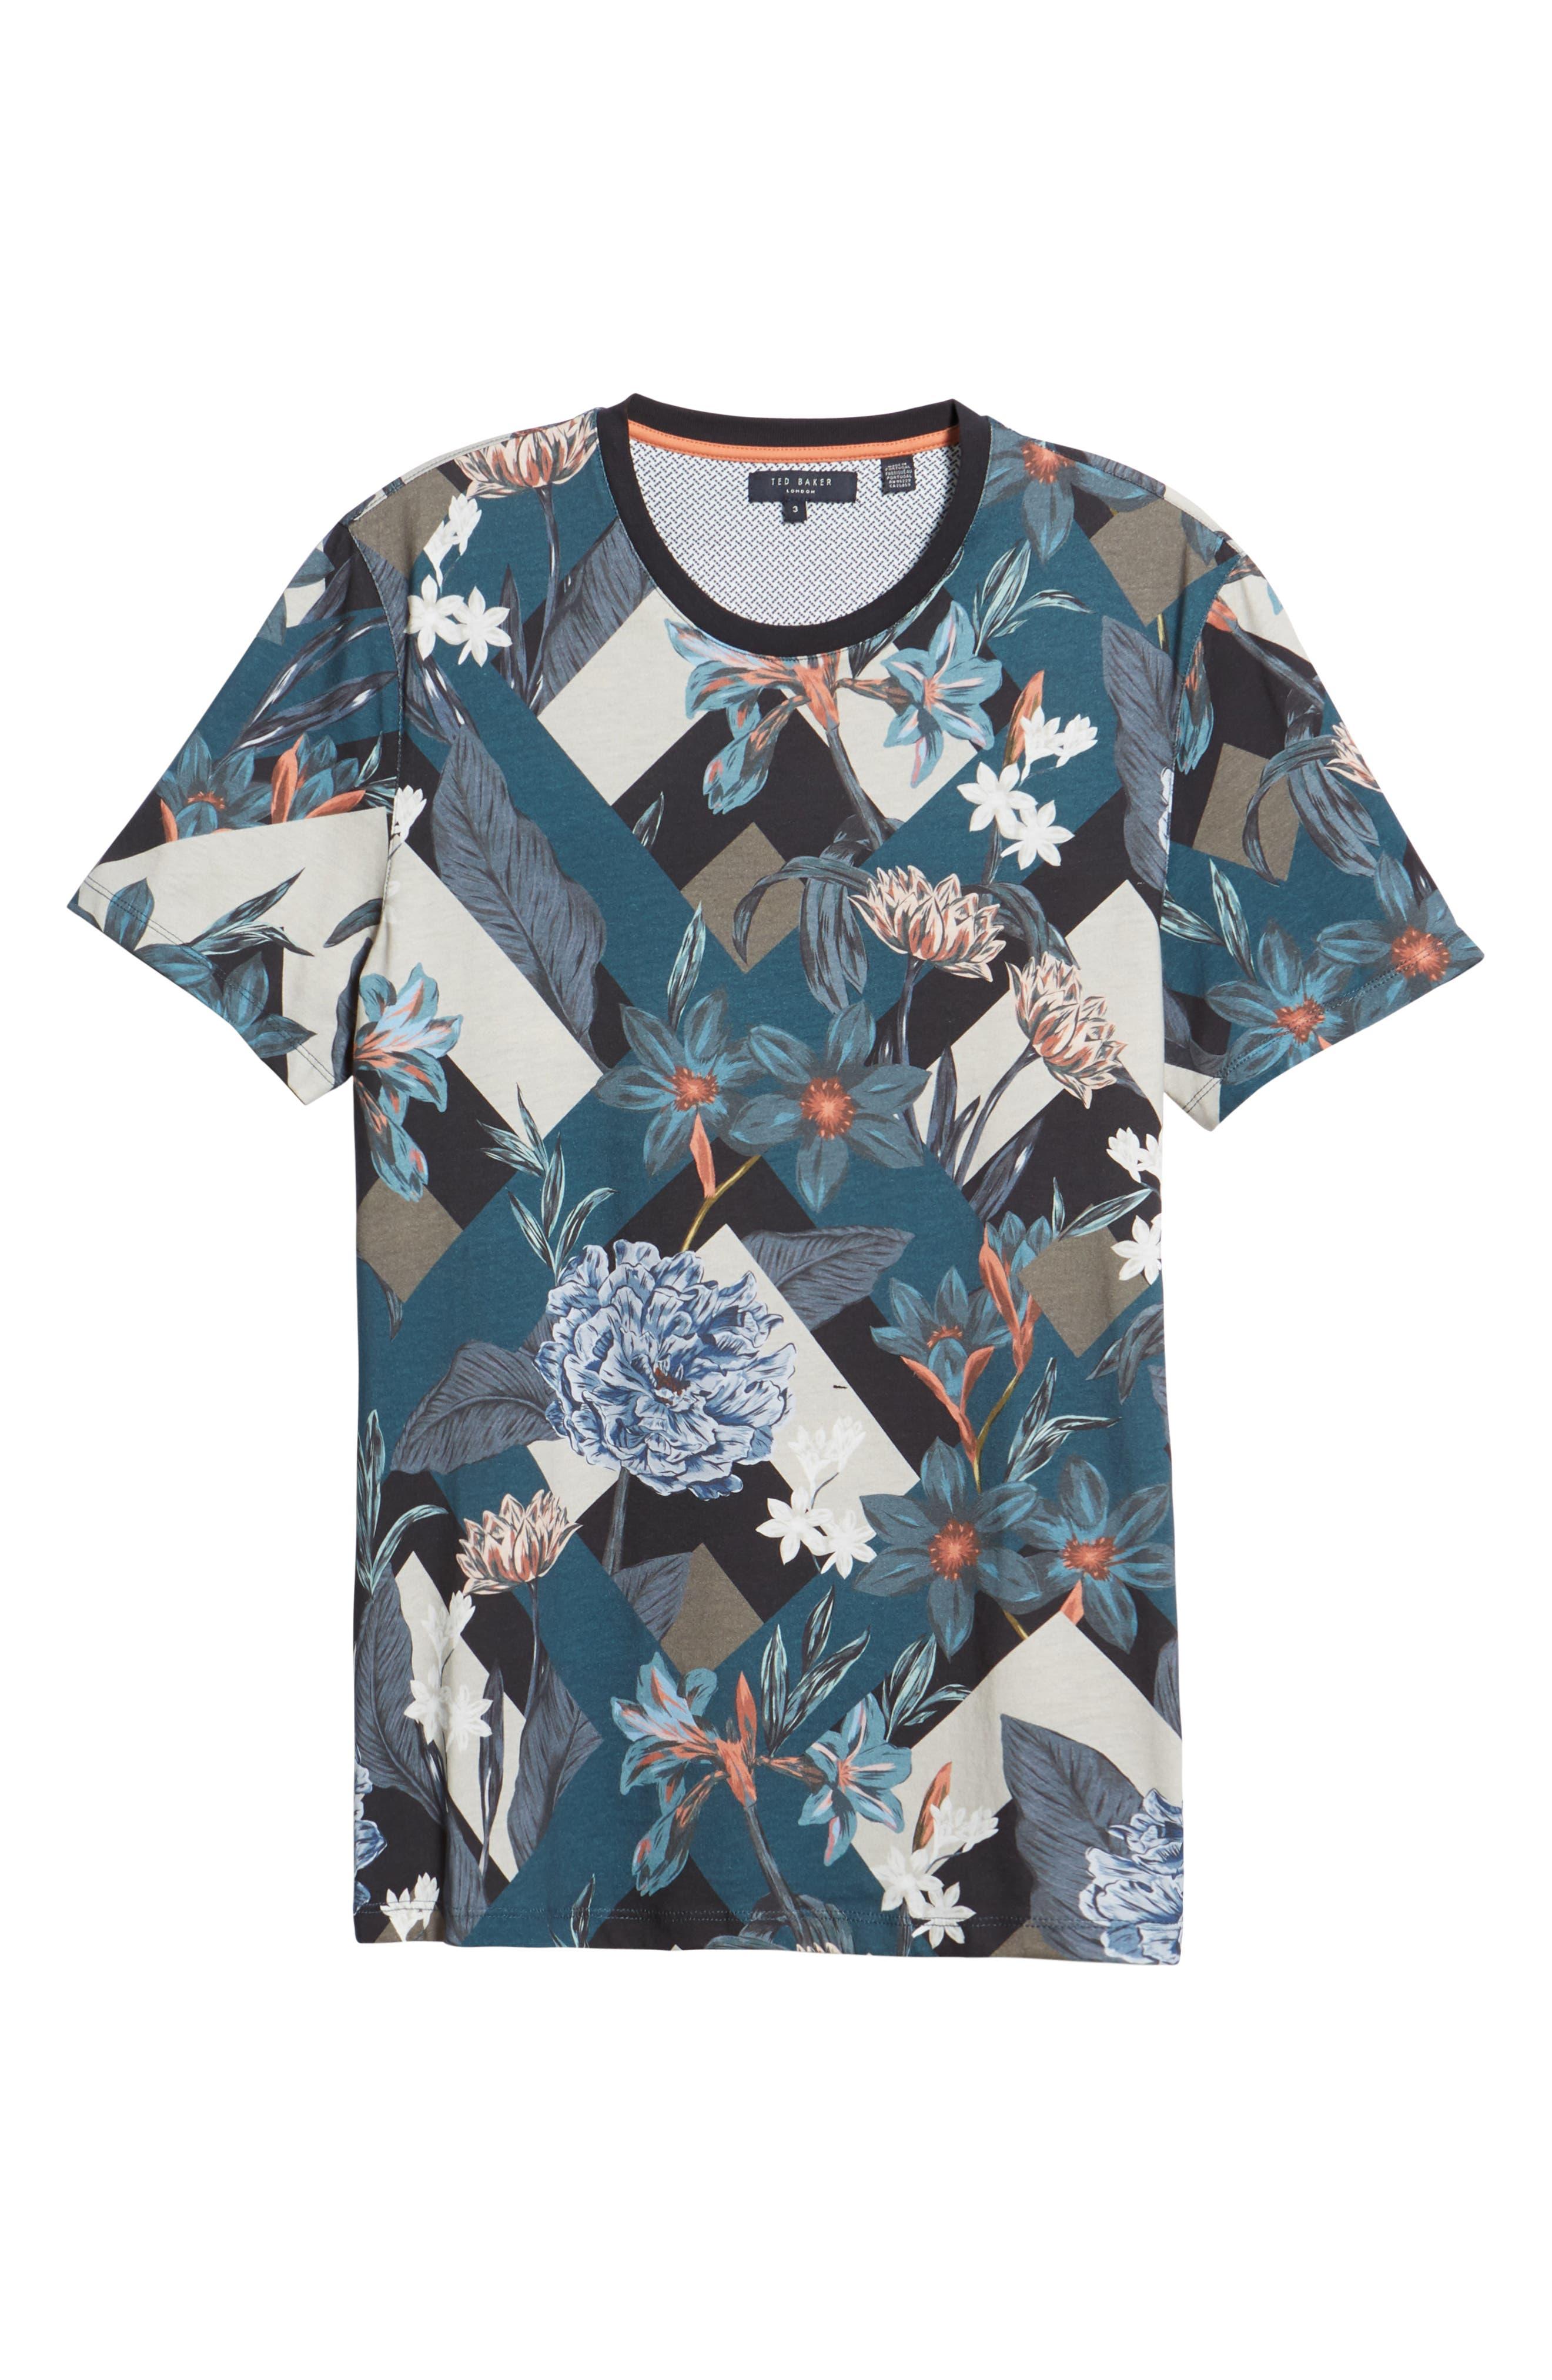 Jolly Slim Fit T-Shirt,                             Alternate thumbnail 6, color,                             NAVY